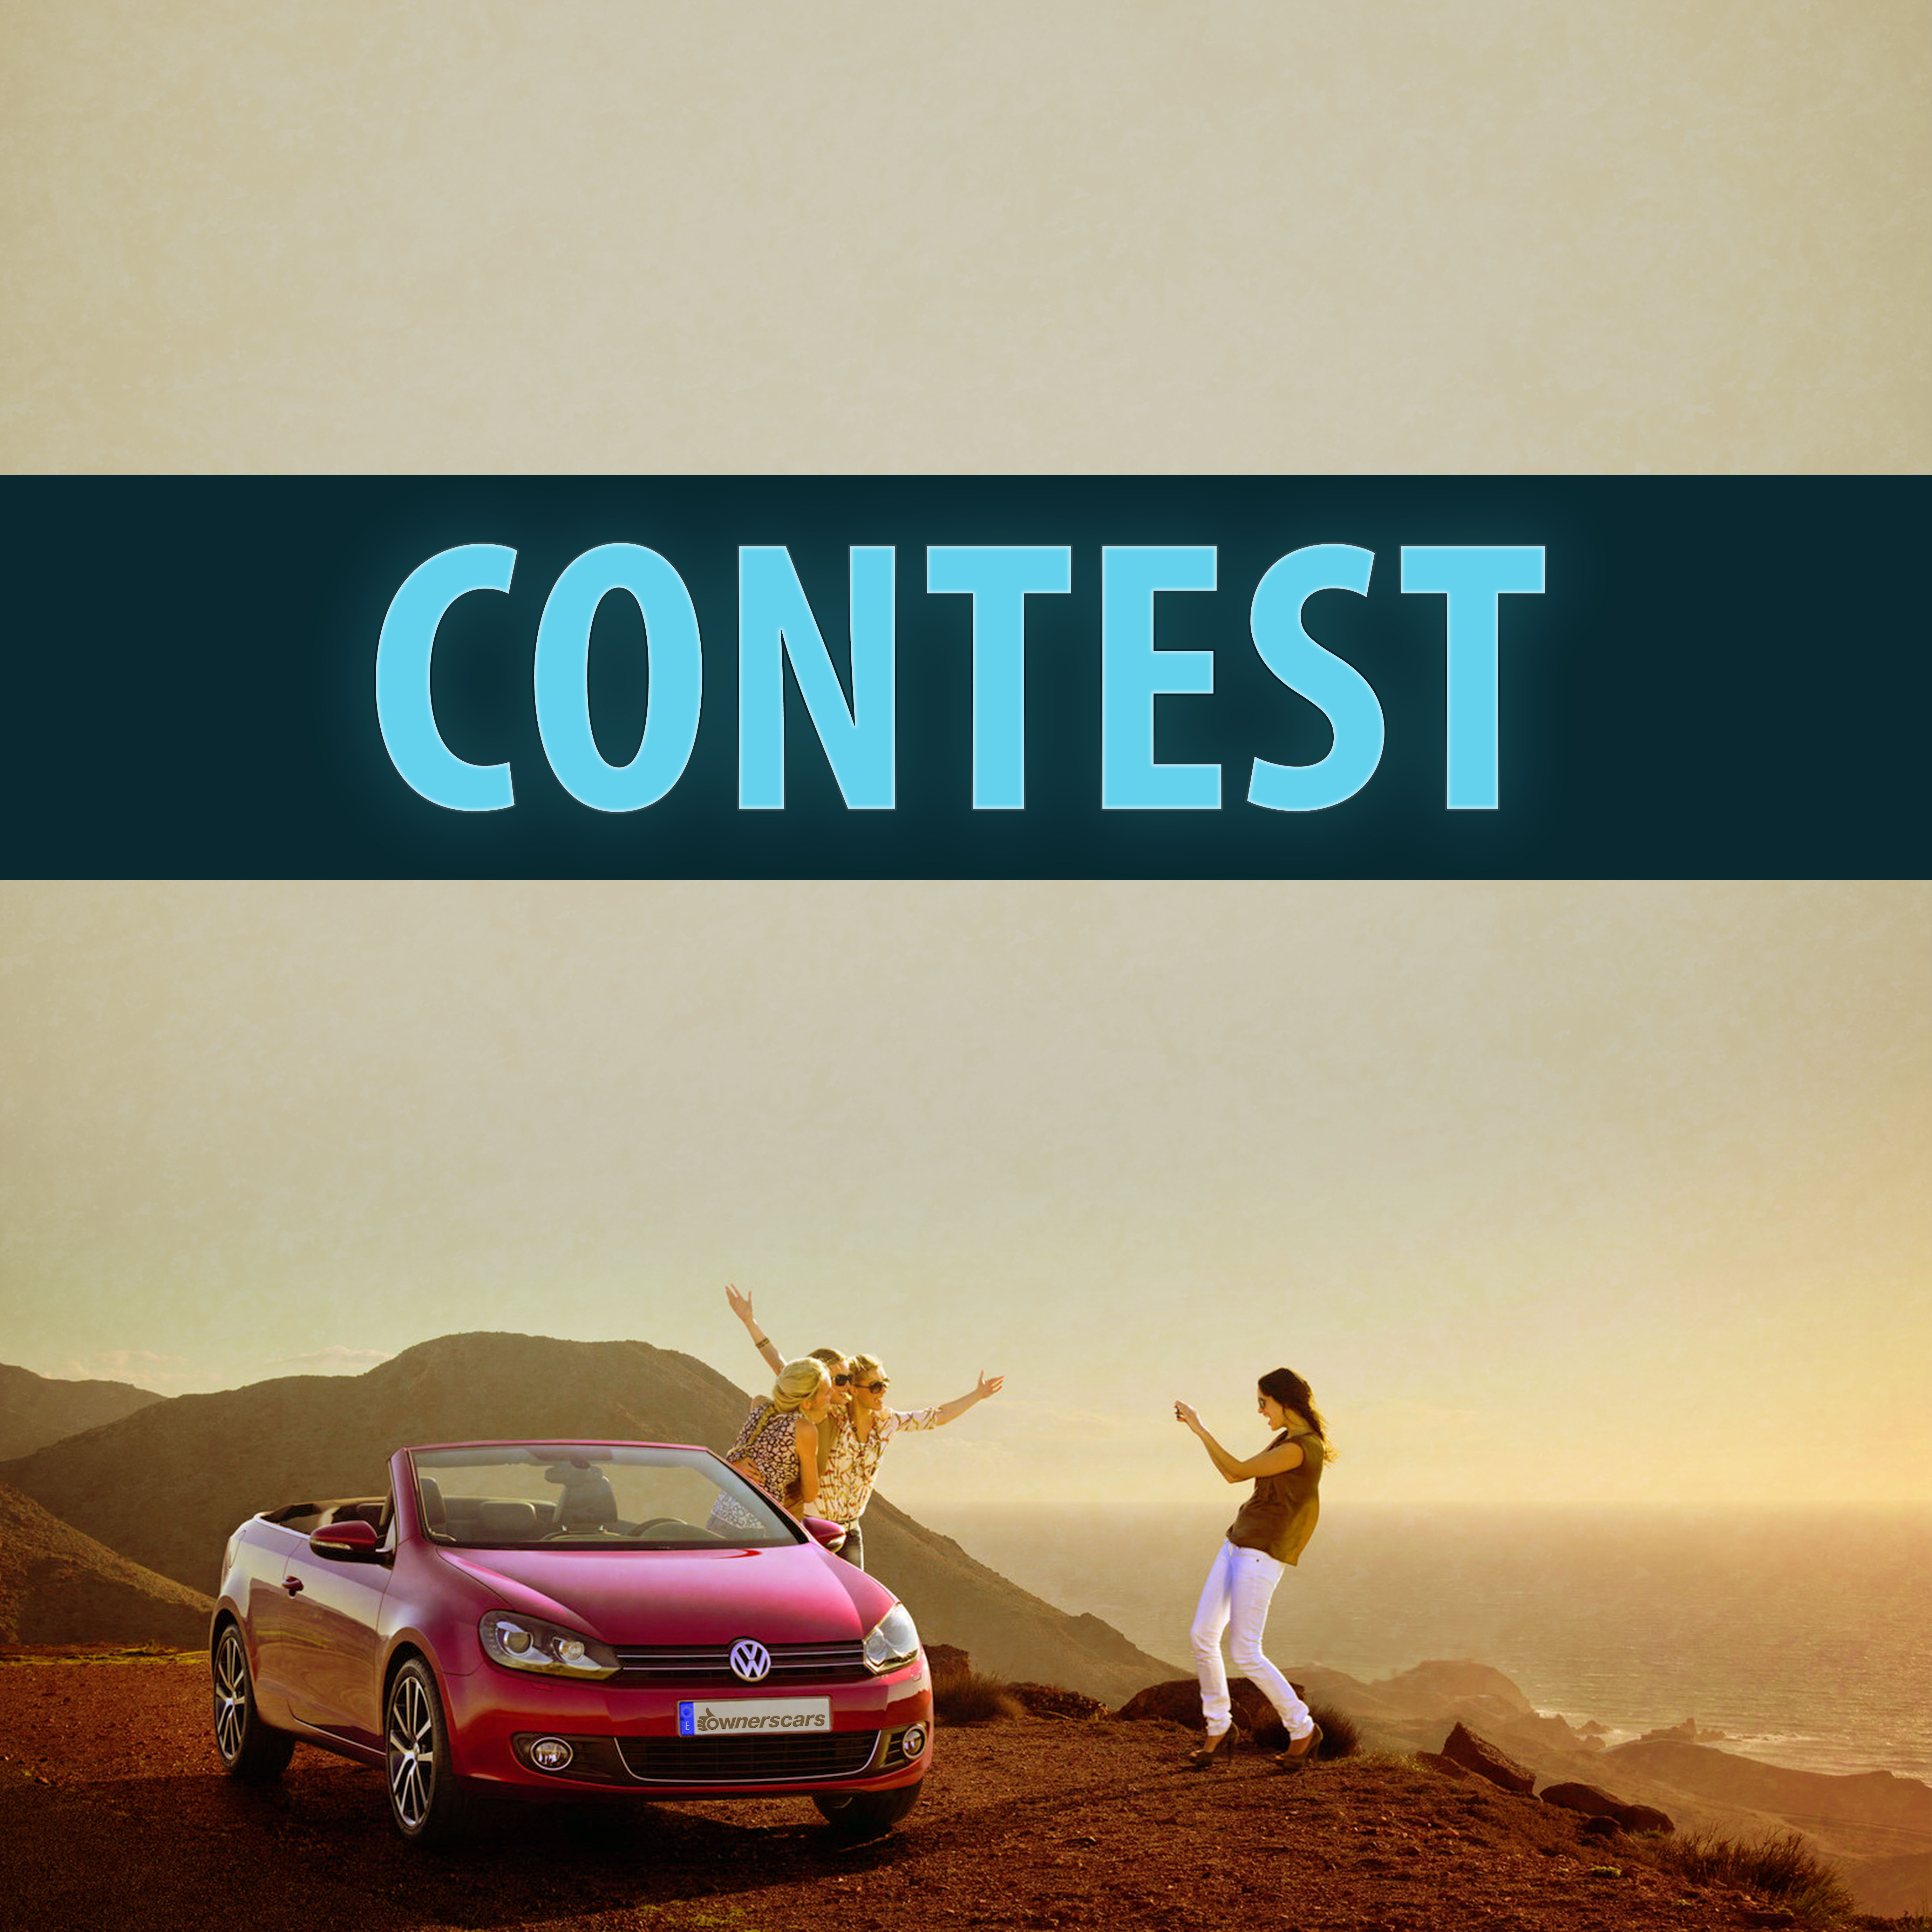 Car Hire Menorca Contest